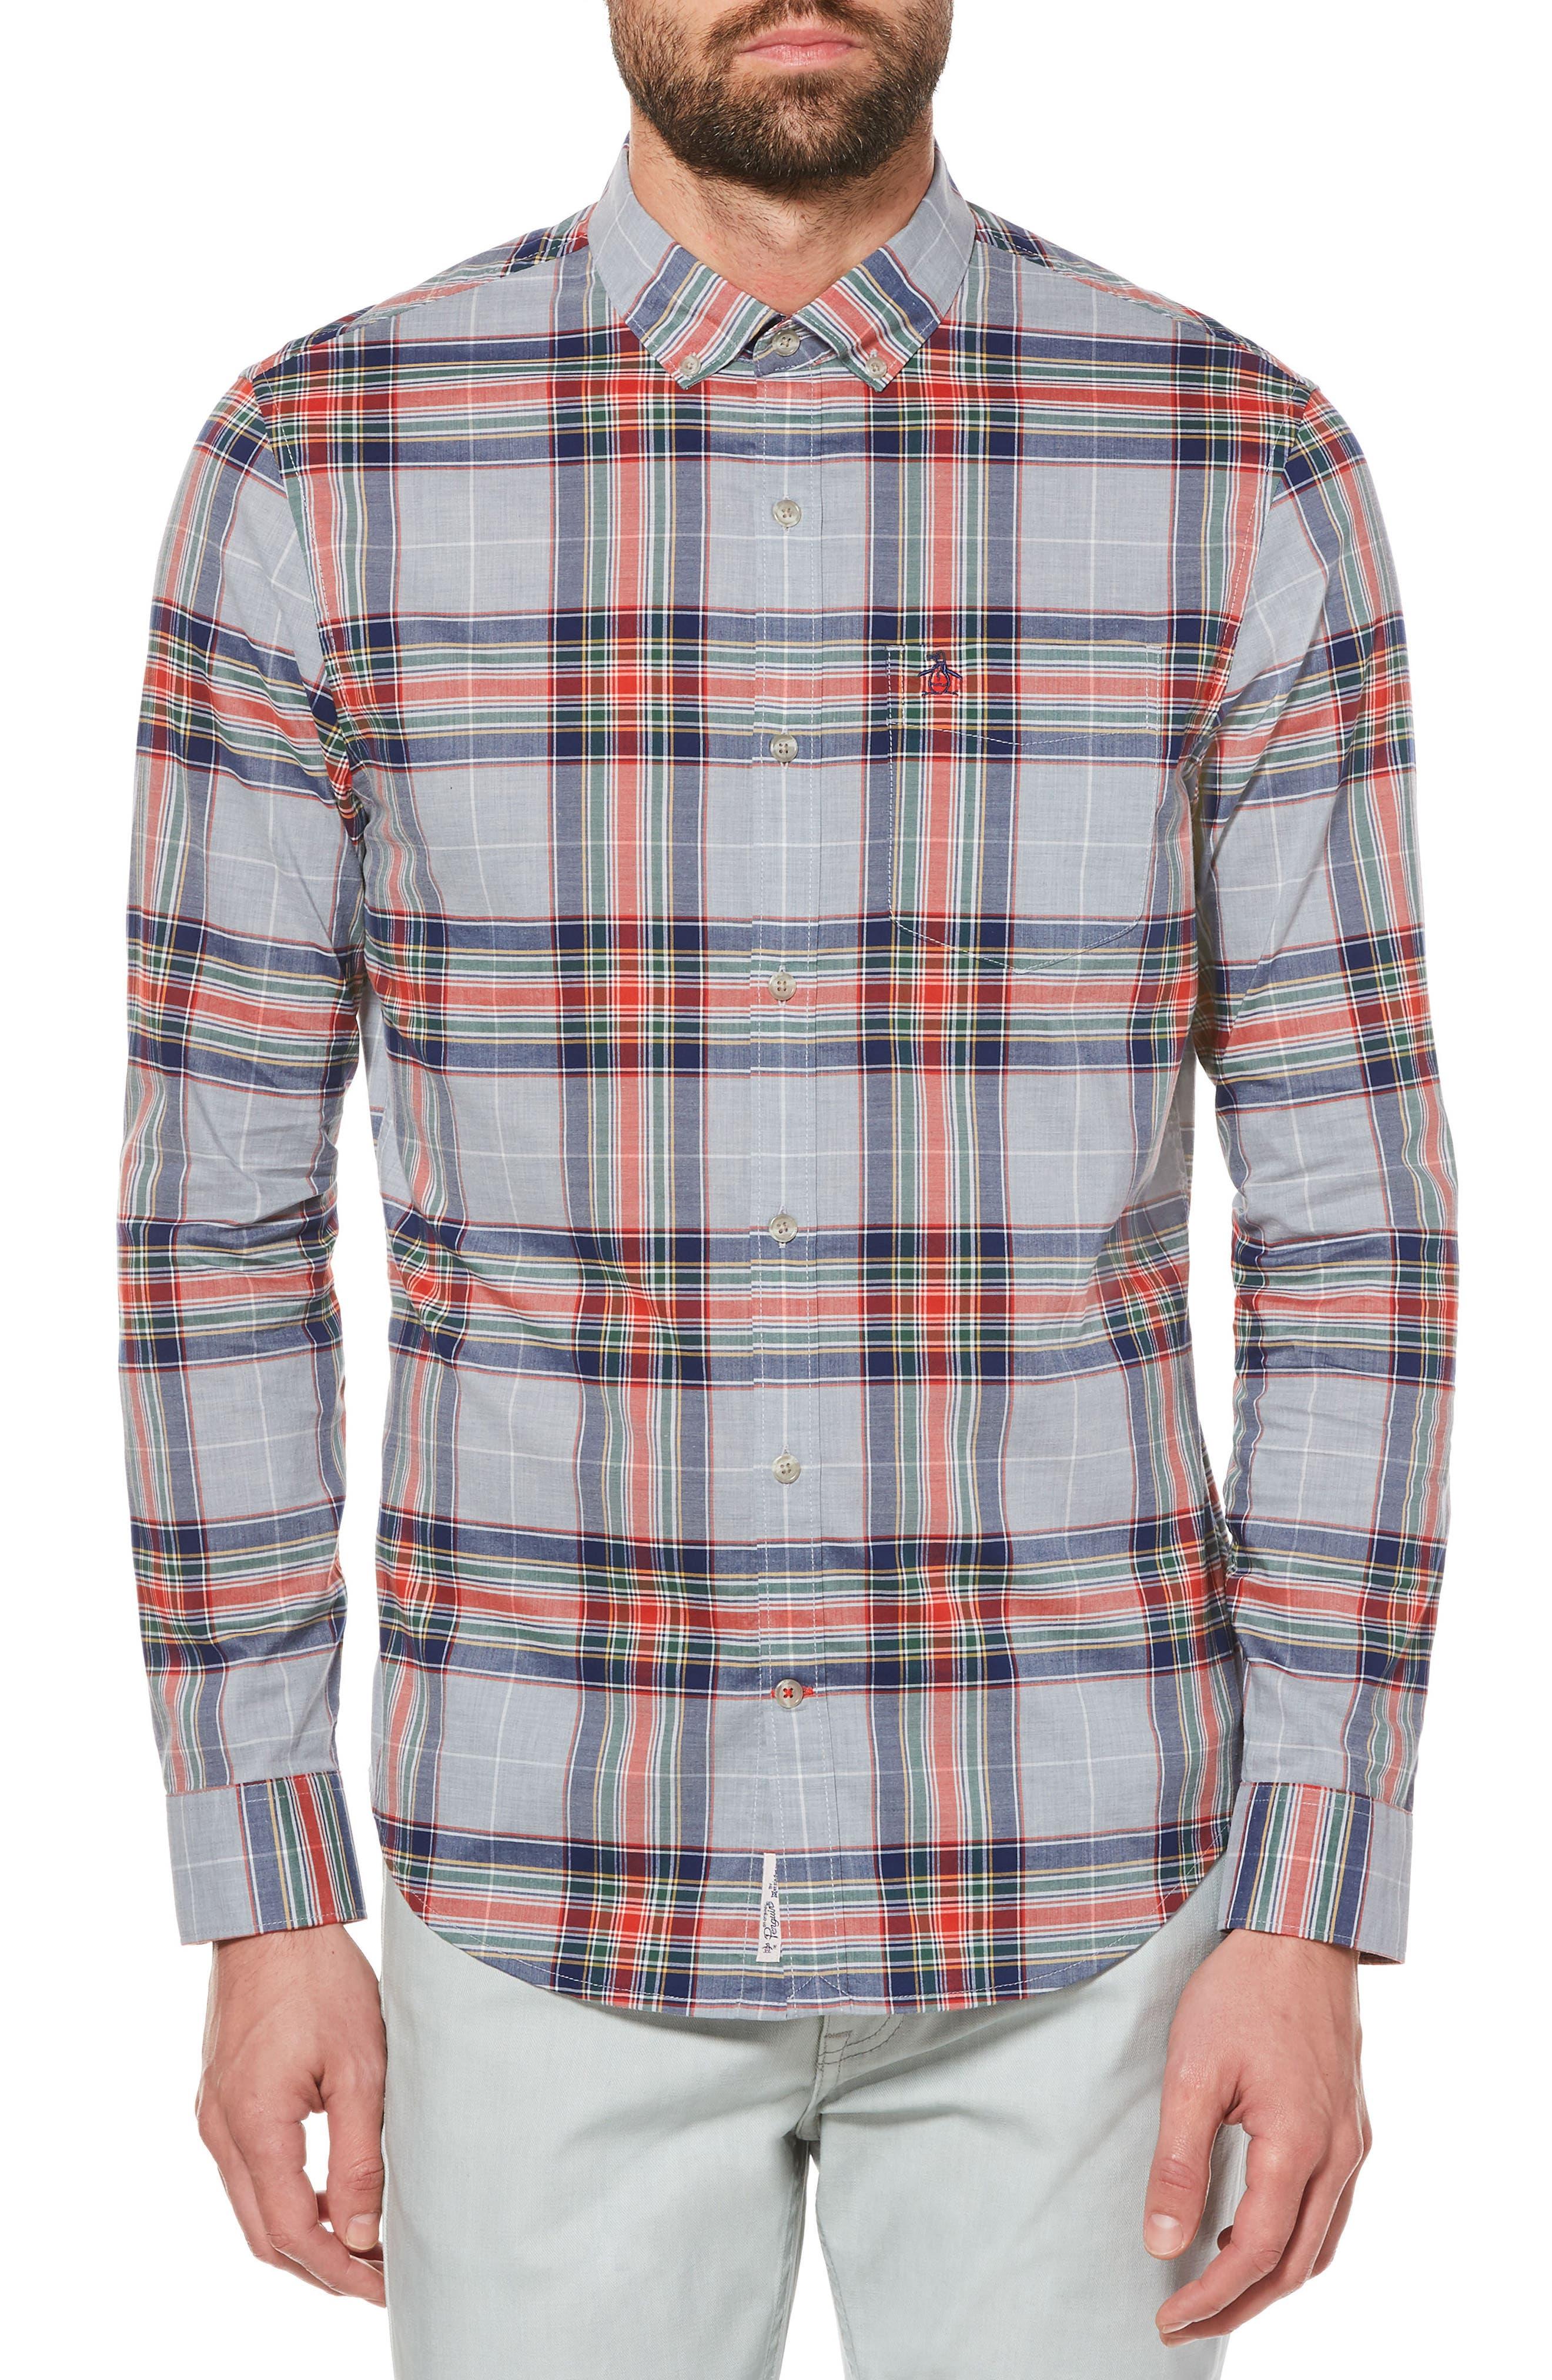 P55 Heritage Slim Fit Plaid Shirt,                             Main thumbnail 1, color,